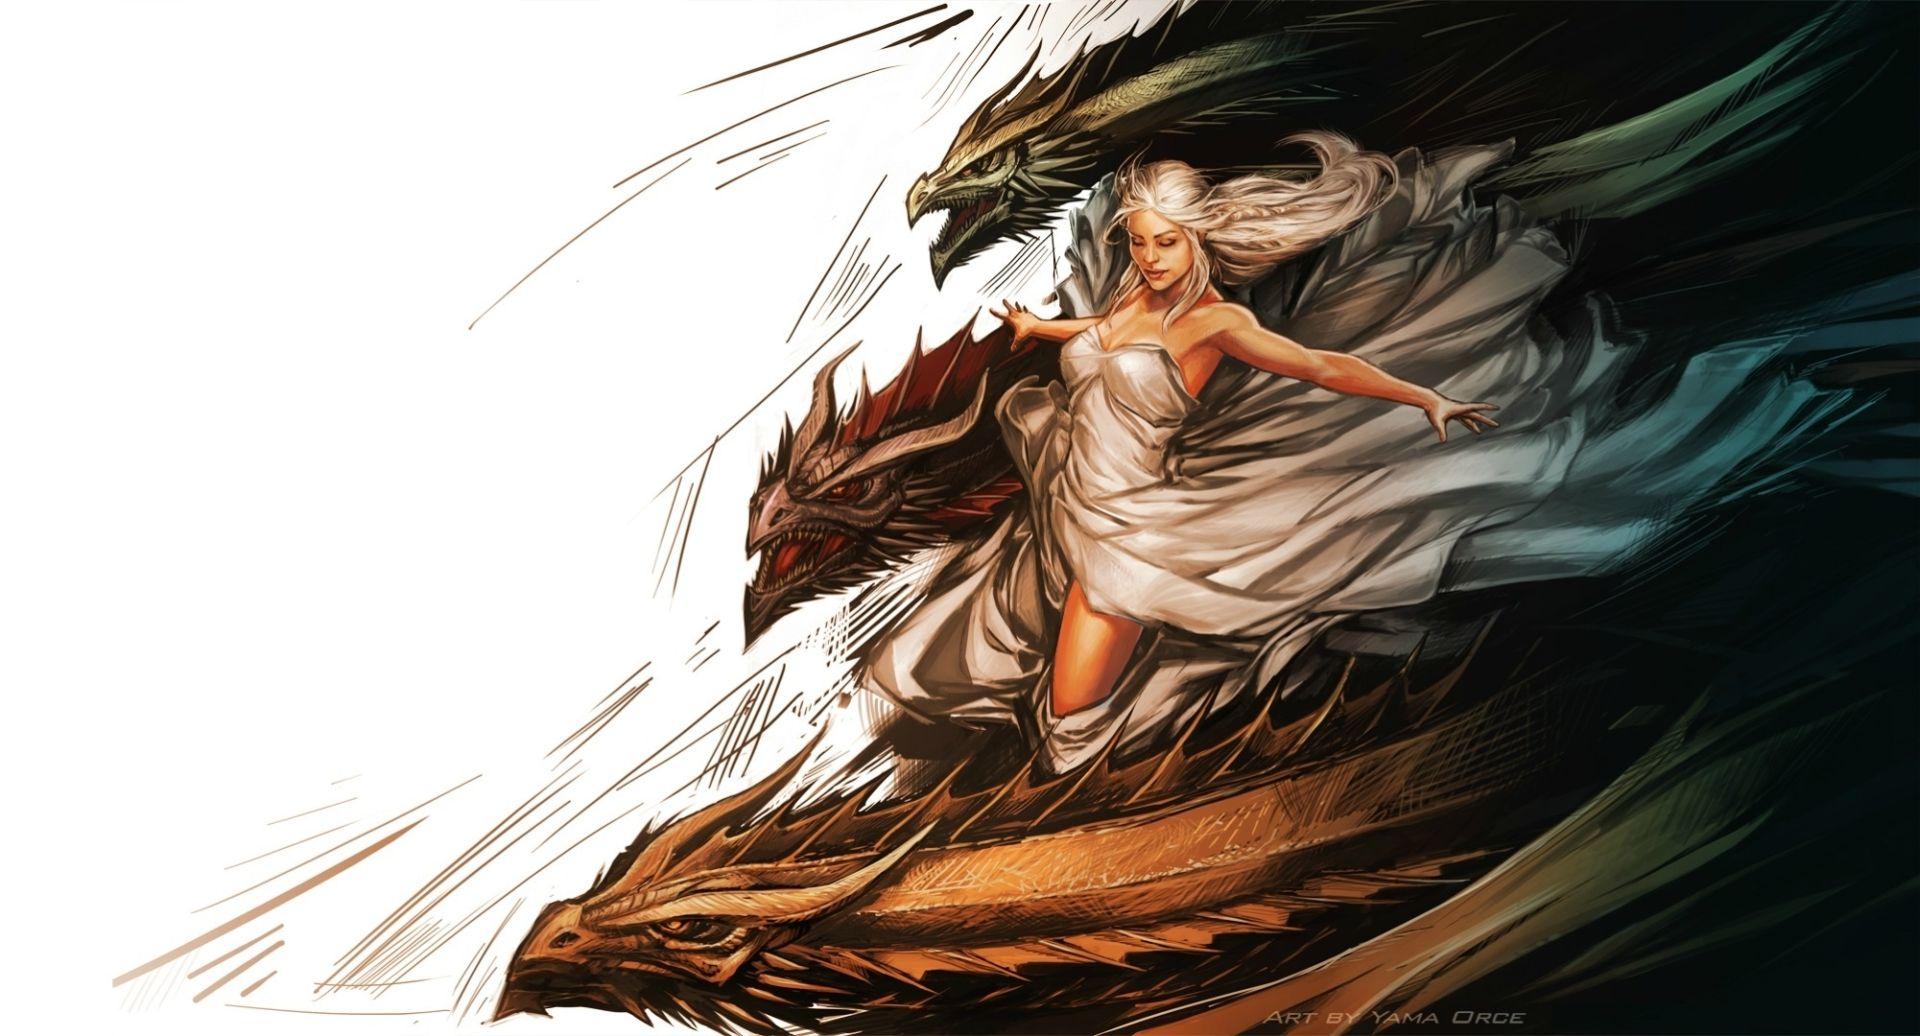 Game of Thrones Daenerys Targaryen picture art